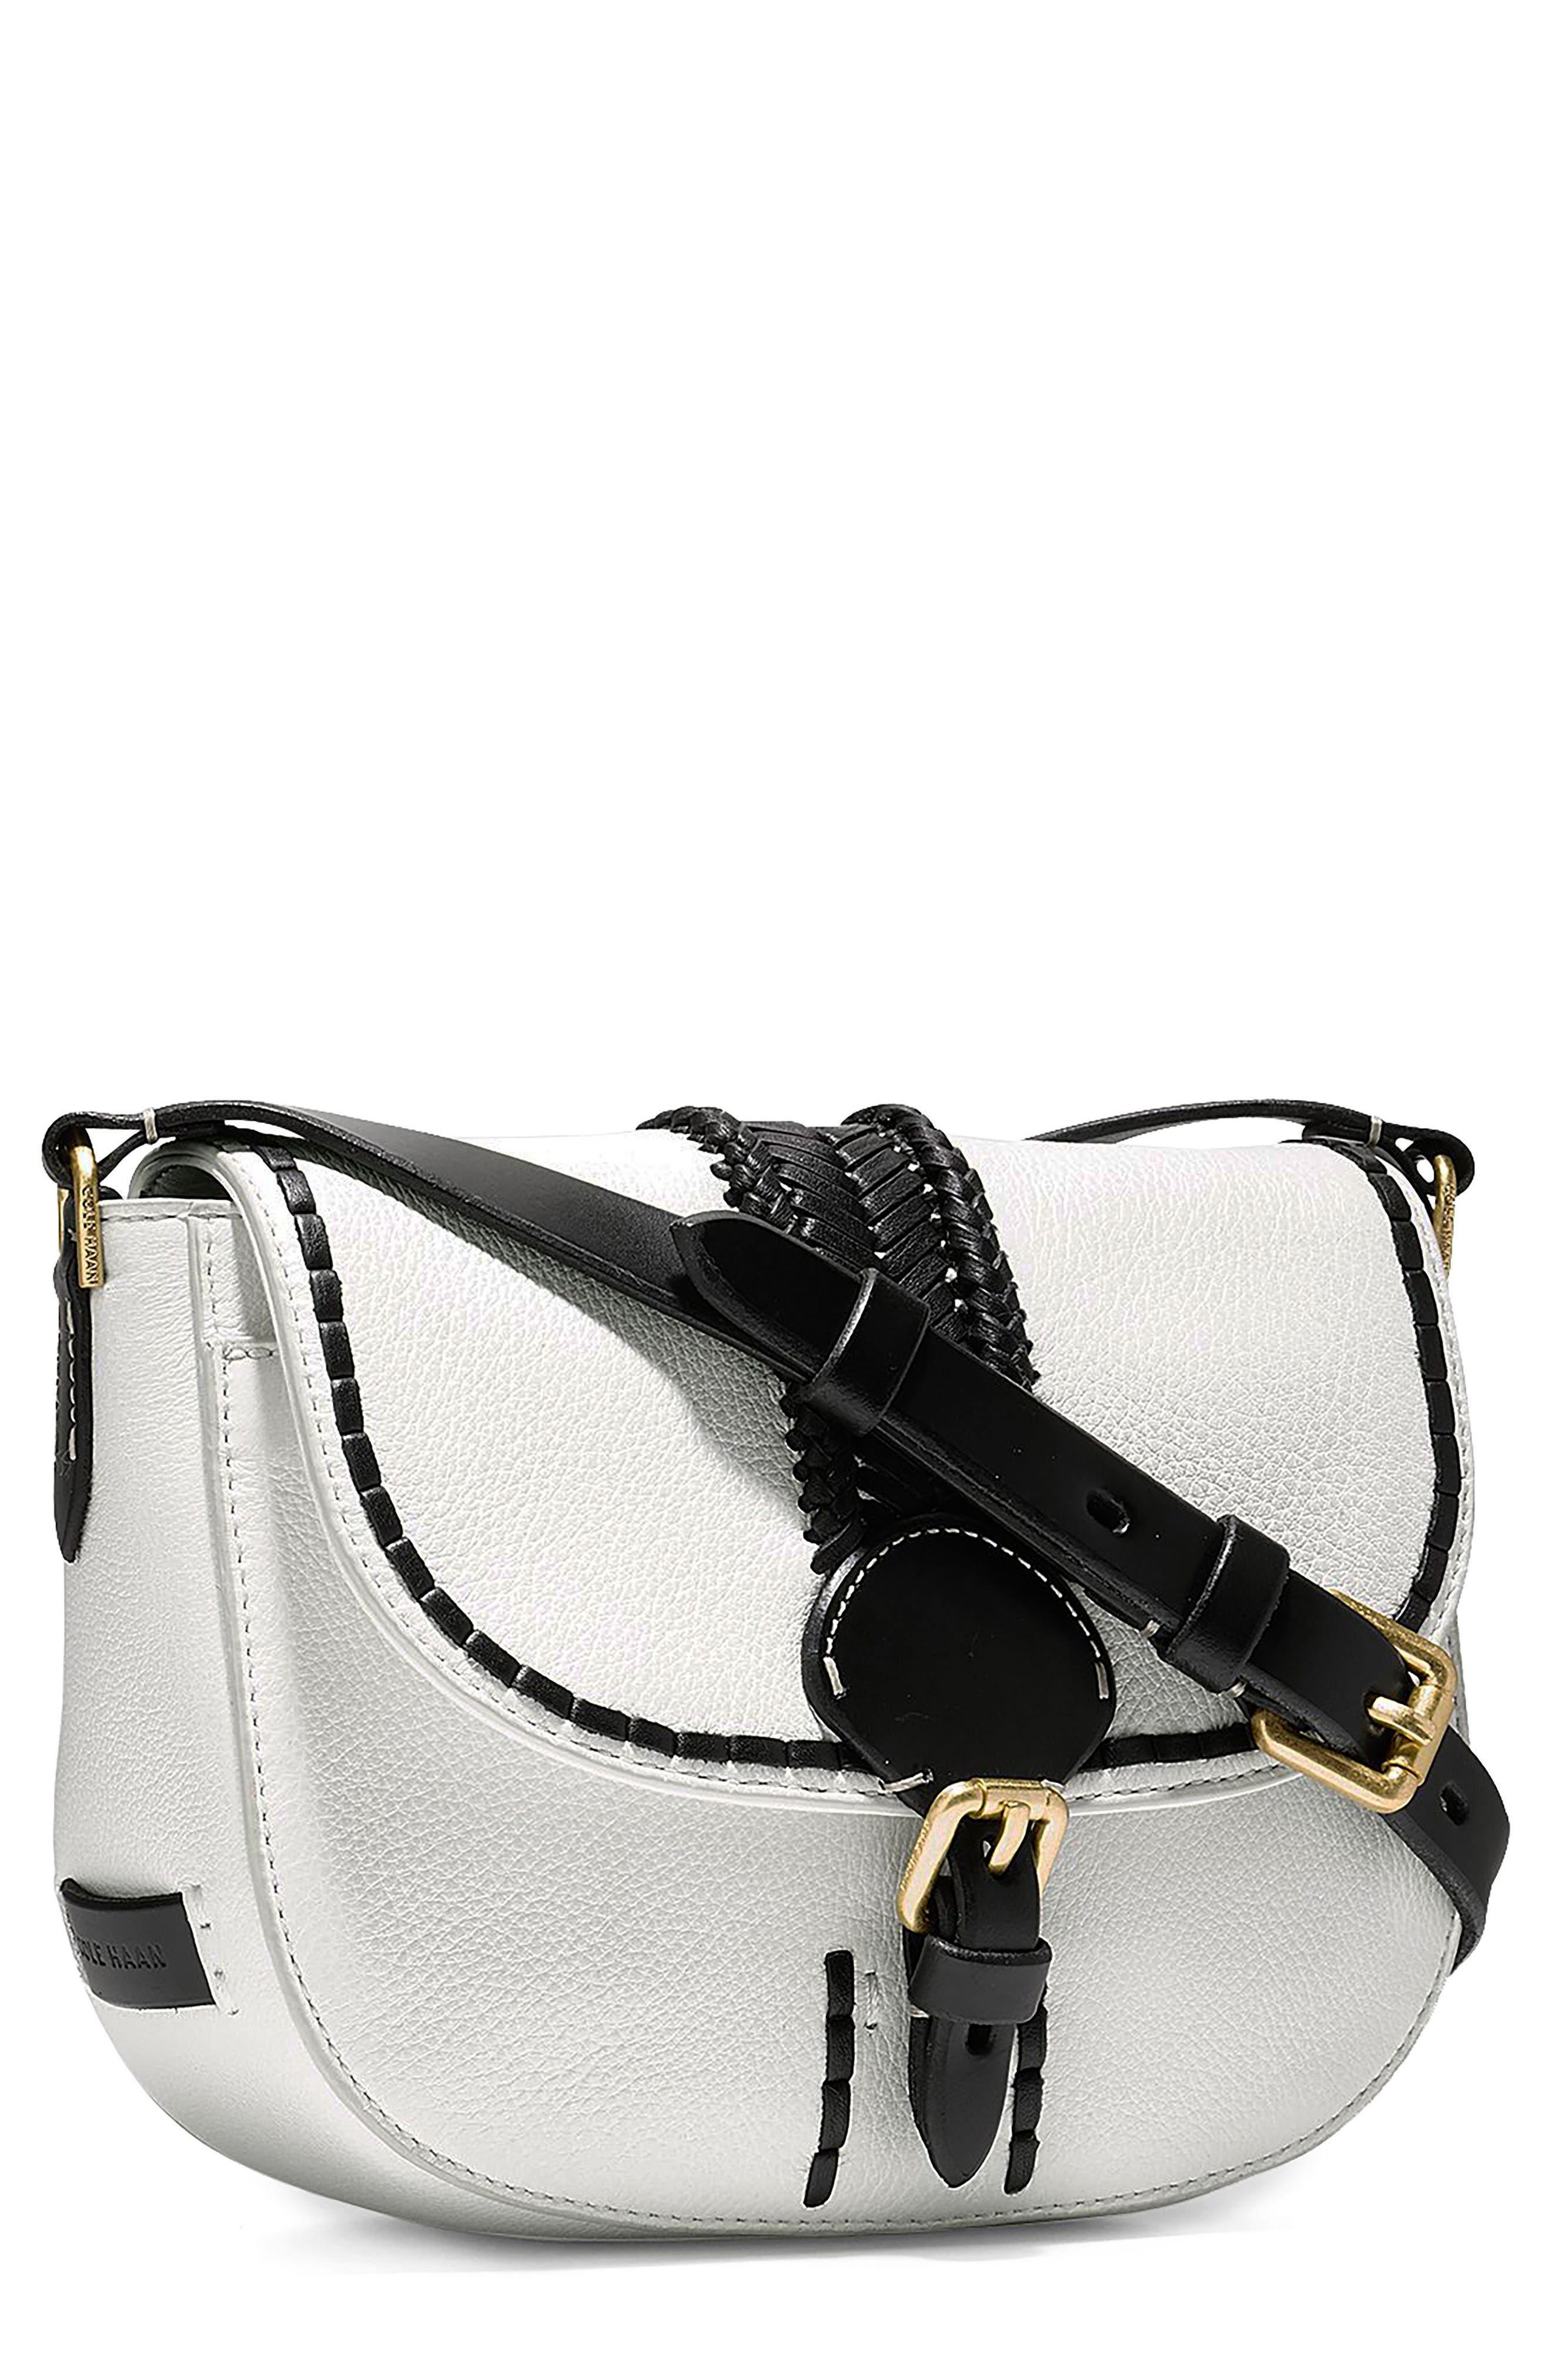 Mini Loralie Whipstitch Leather Saddle Bag,                             Main thumbnail 2, color,